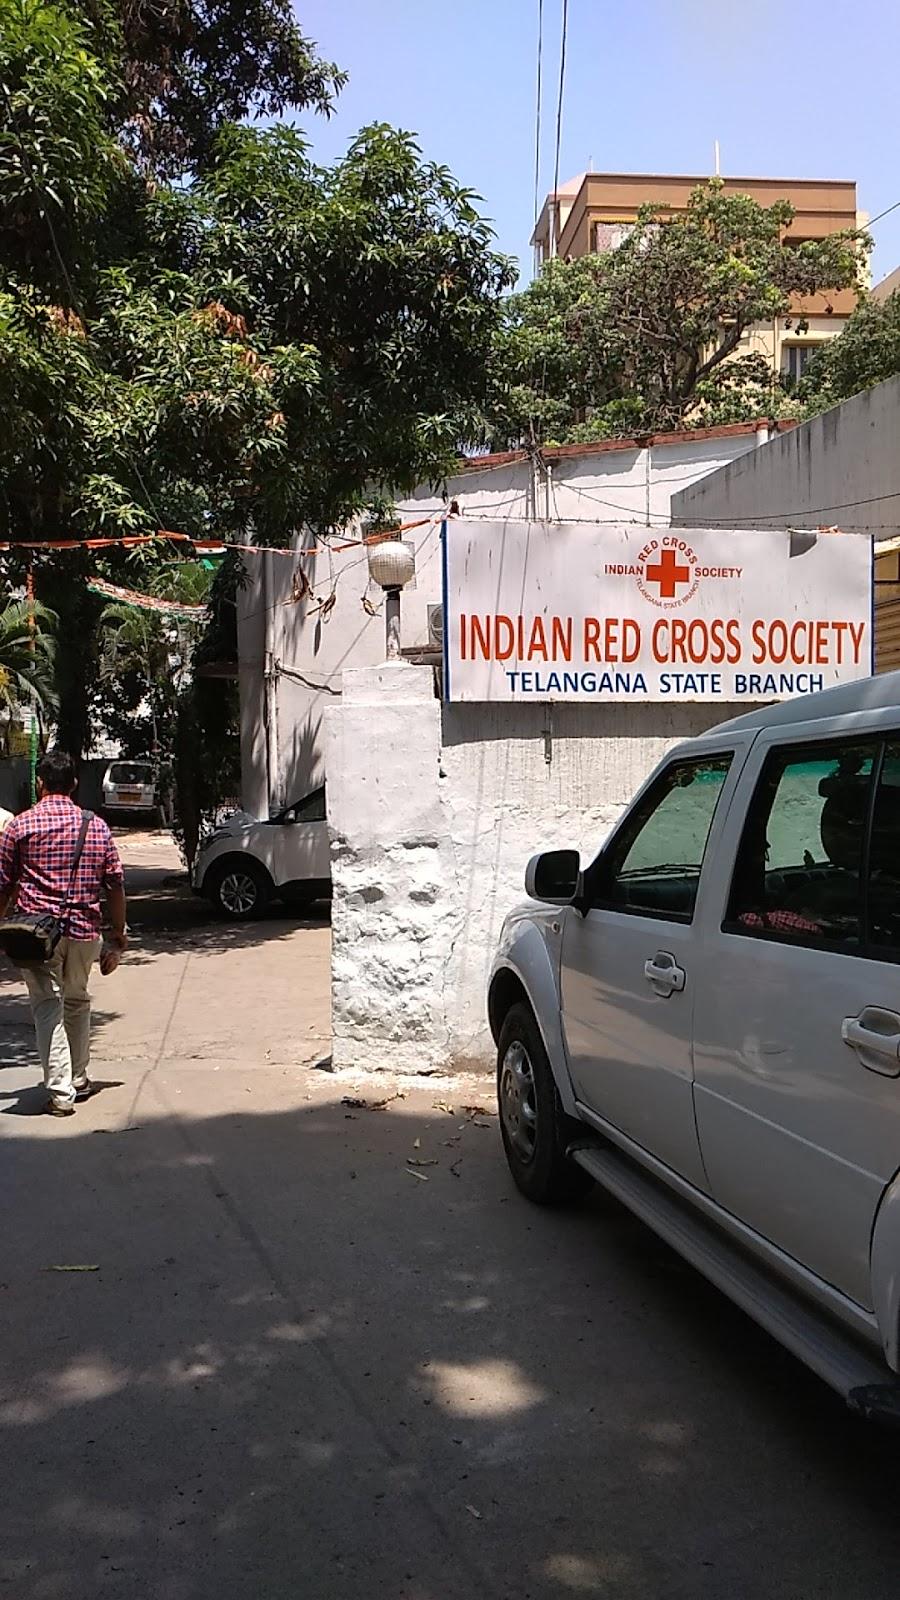 blood bank Indian Red Cross Society near Hyderabad Telangana